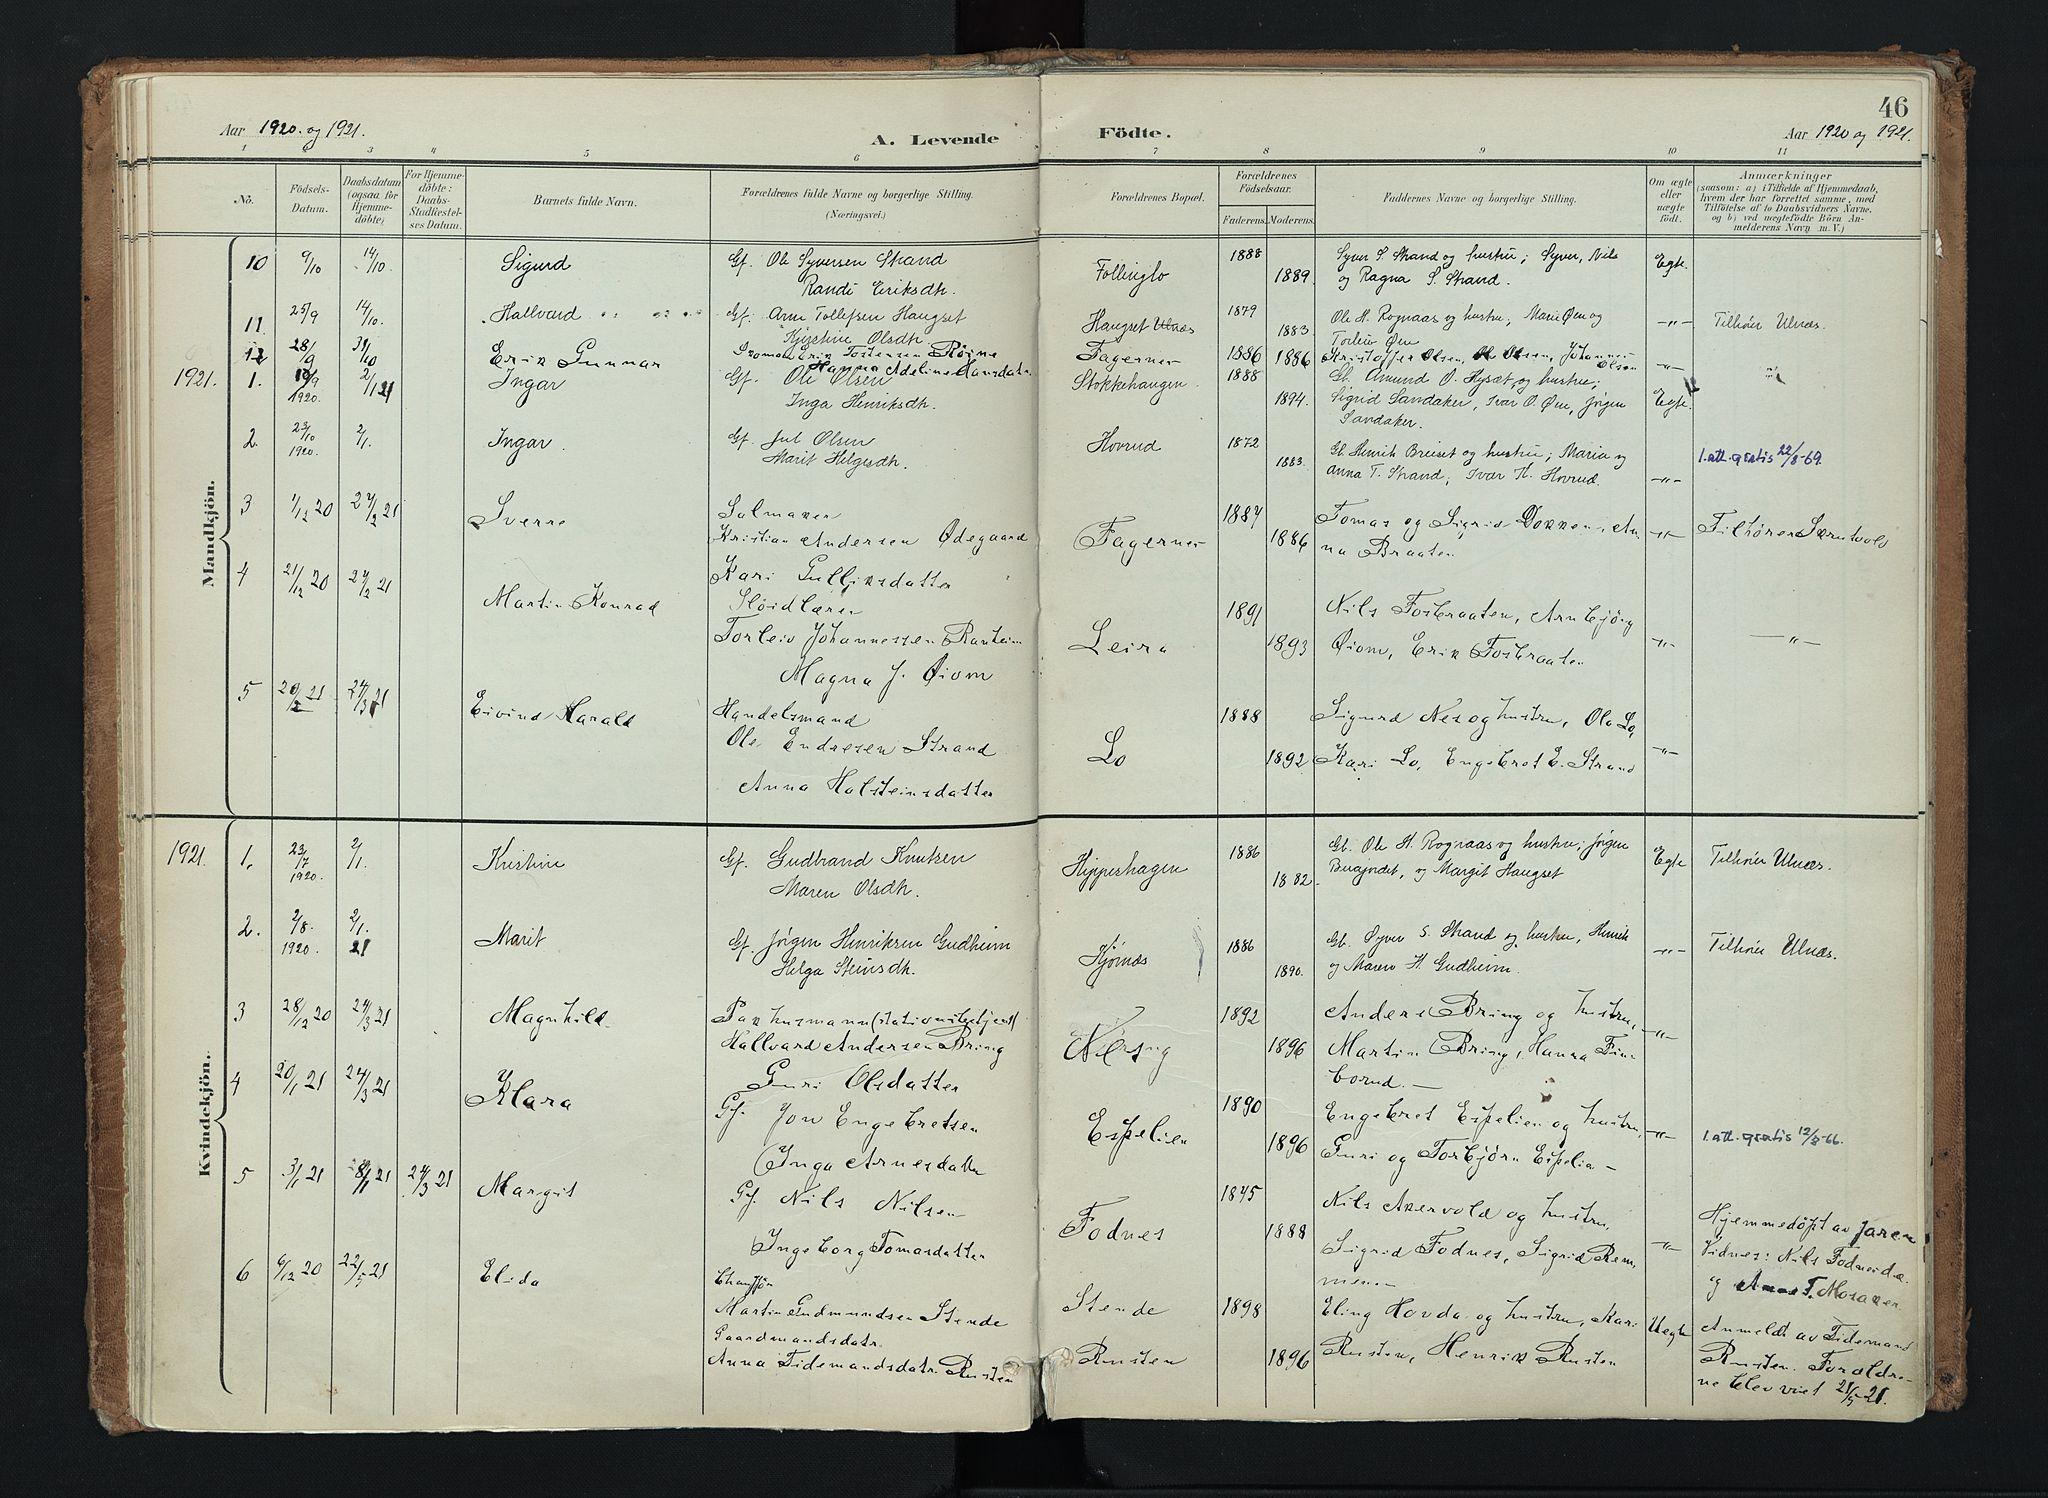 SAH, Nord-Aurdal prestekontor, Ministerialbok nr. 16, 1897-1925, s. 46